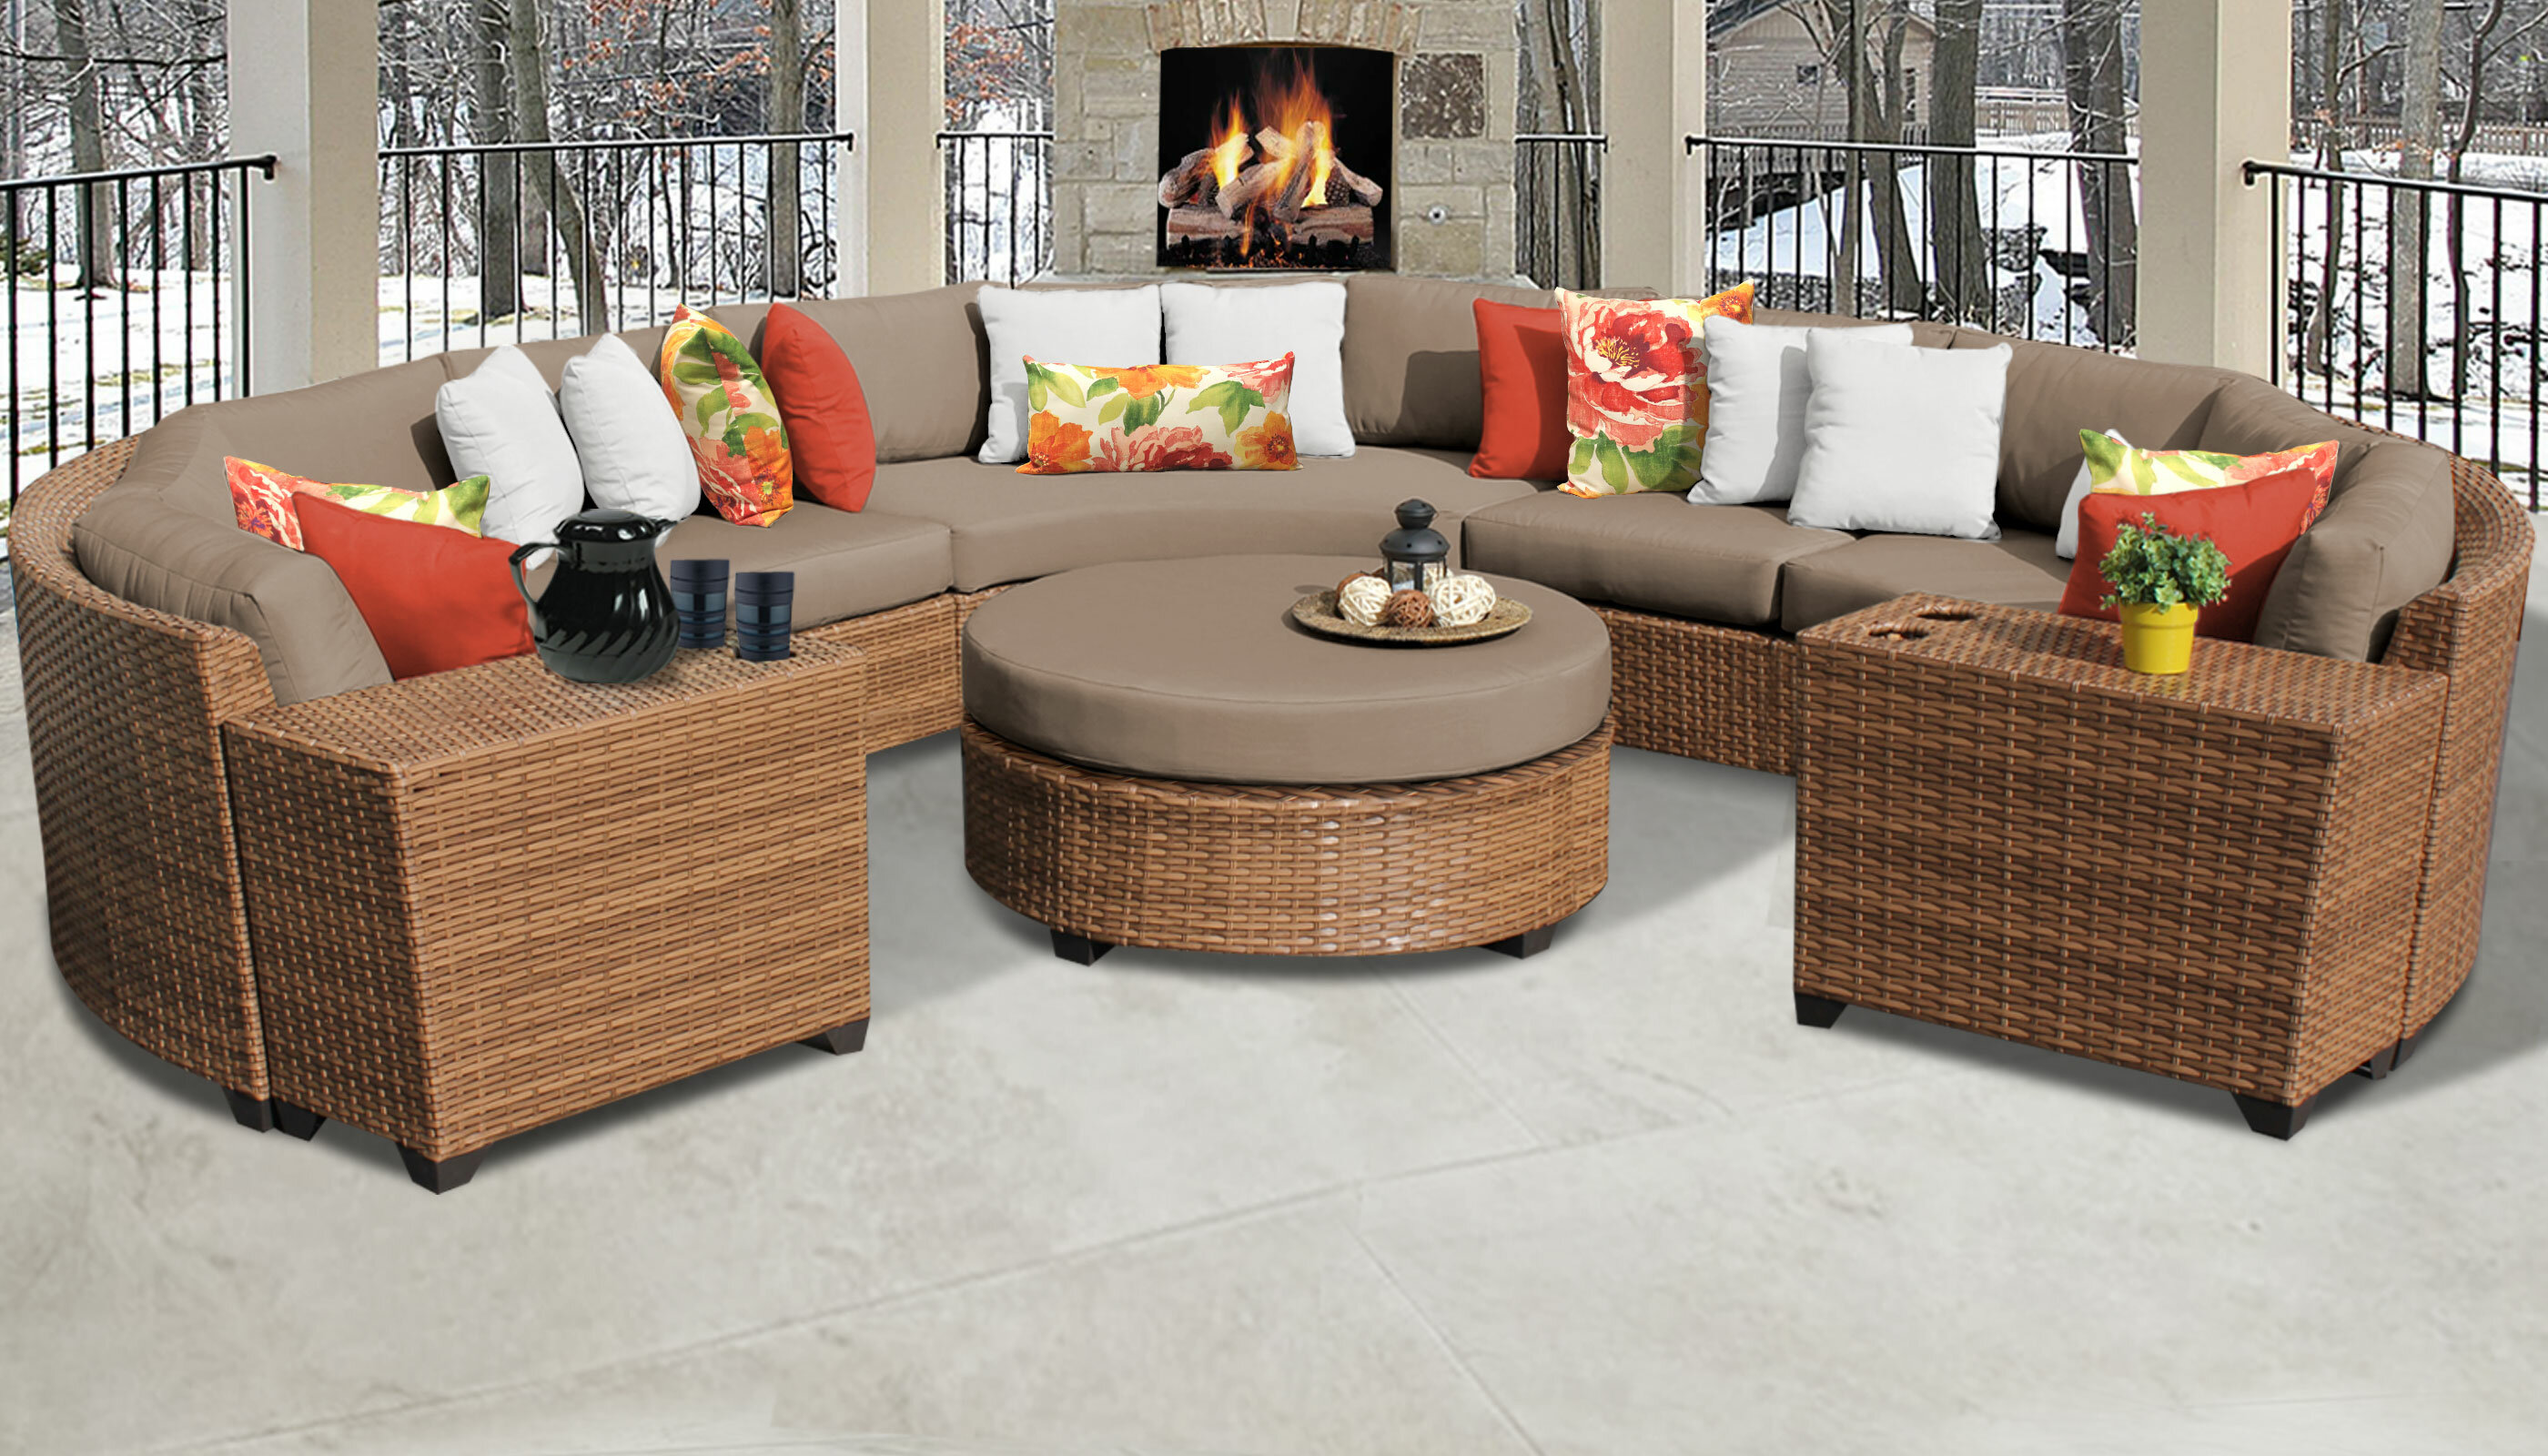 Superb Rosecliff Heights Medina 8 Piece Sectional Seating Group Customarchery Wood Chair Design Ideas Customarcherynet